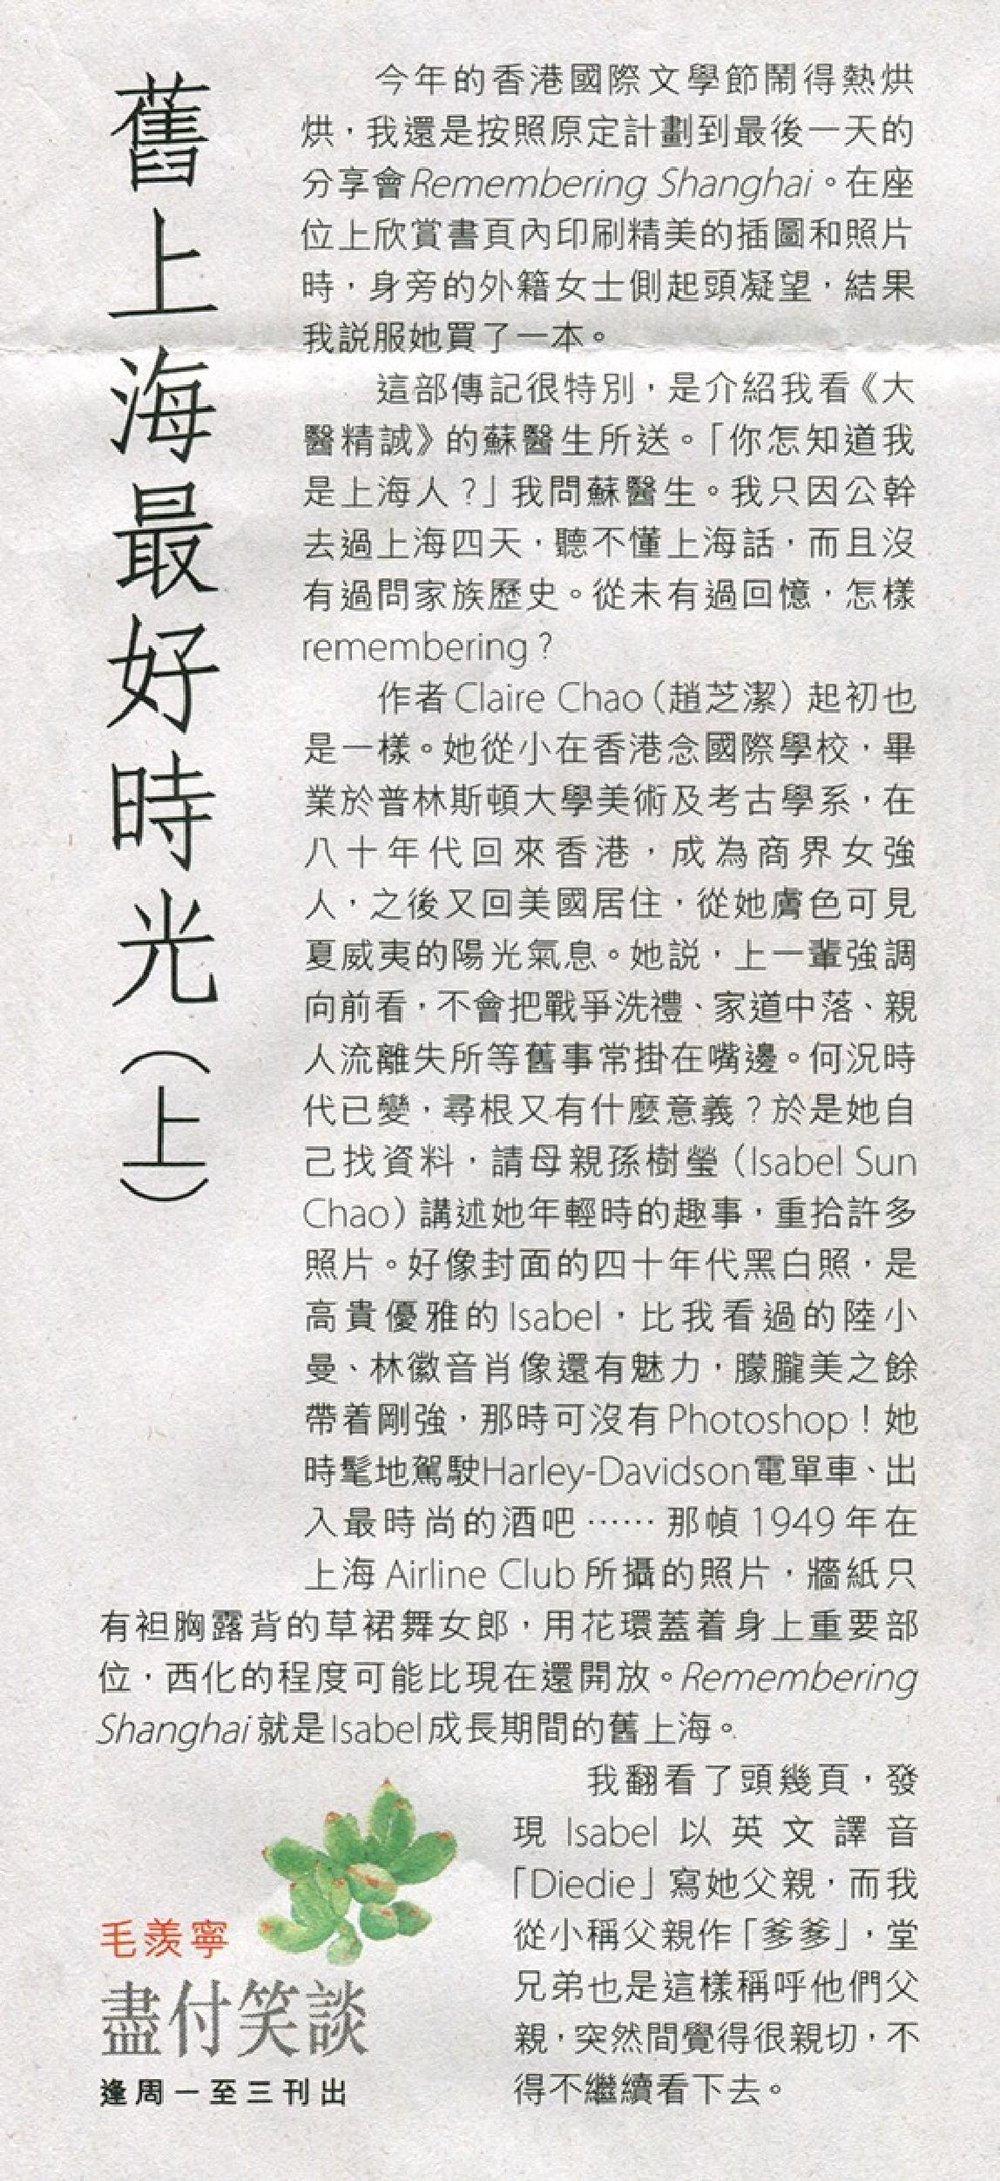 Hong Kong Economic Journal,  November 2018